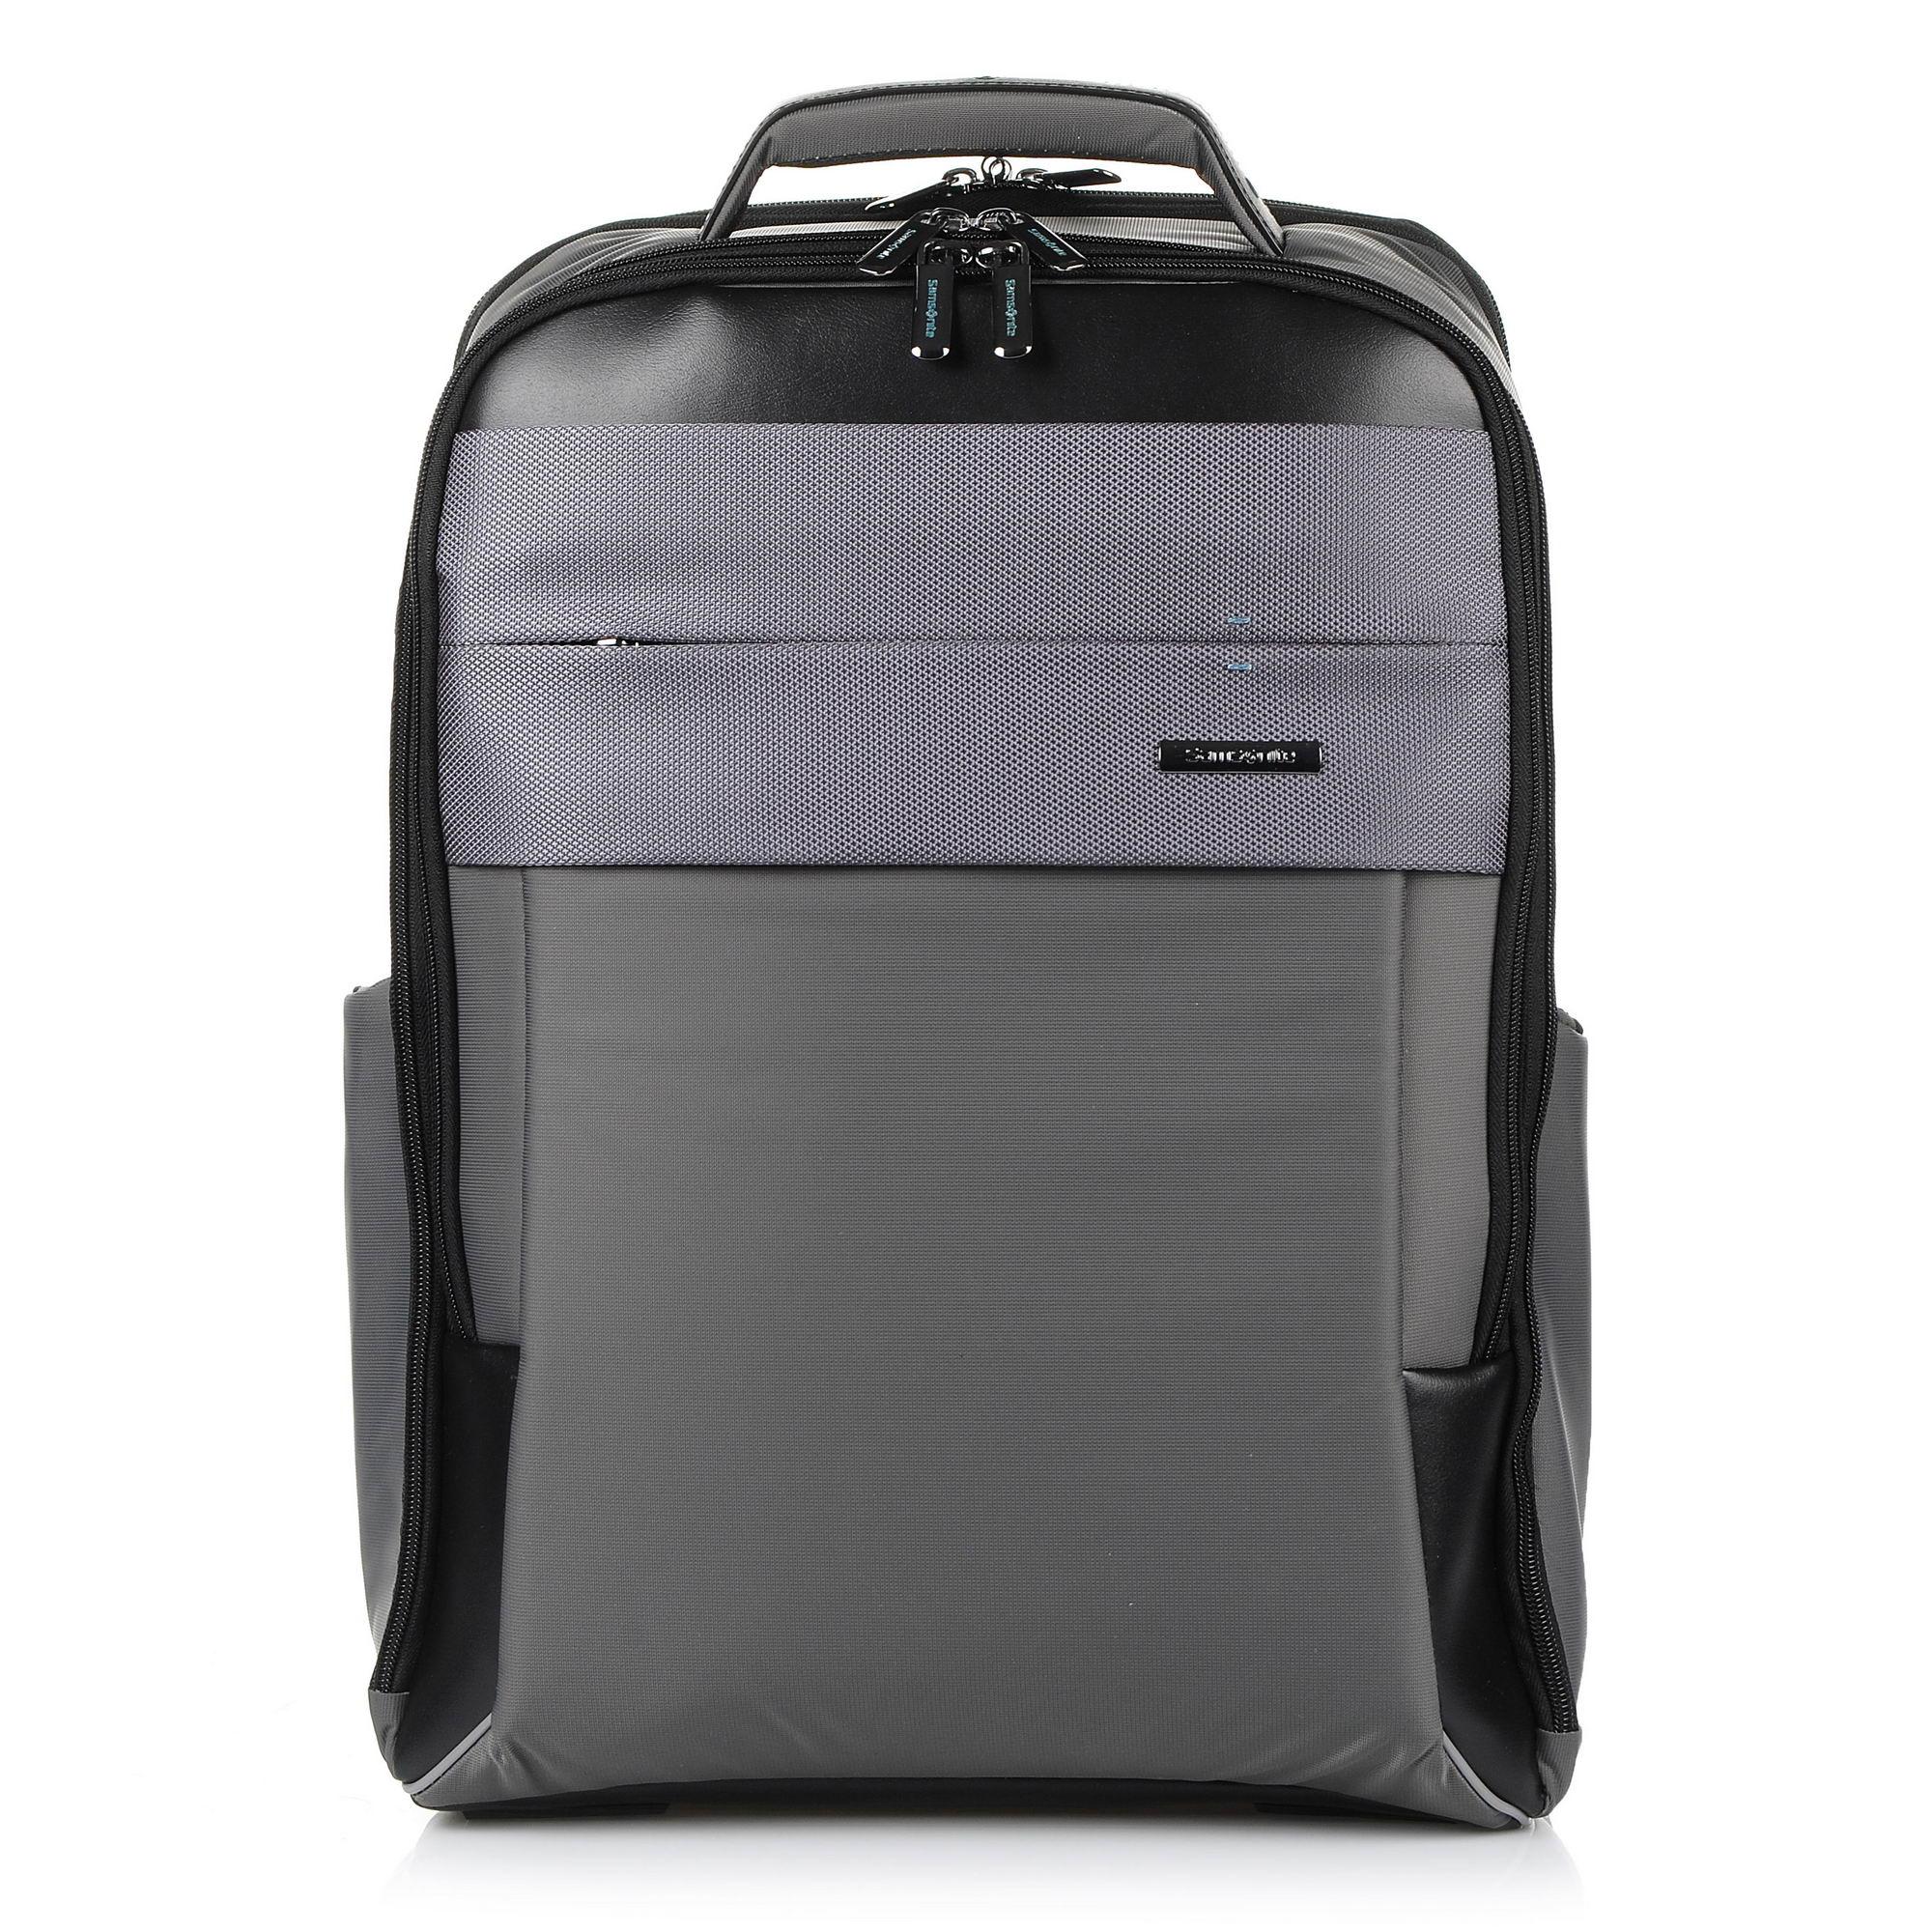 47b33d29ba5 Σακίδιο Πλάτης Samsonite Spectrolite 2.0 Laptop Backpack 17.3'' 103576